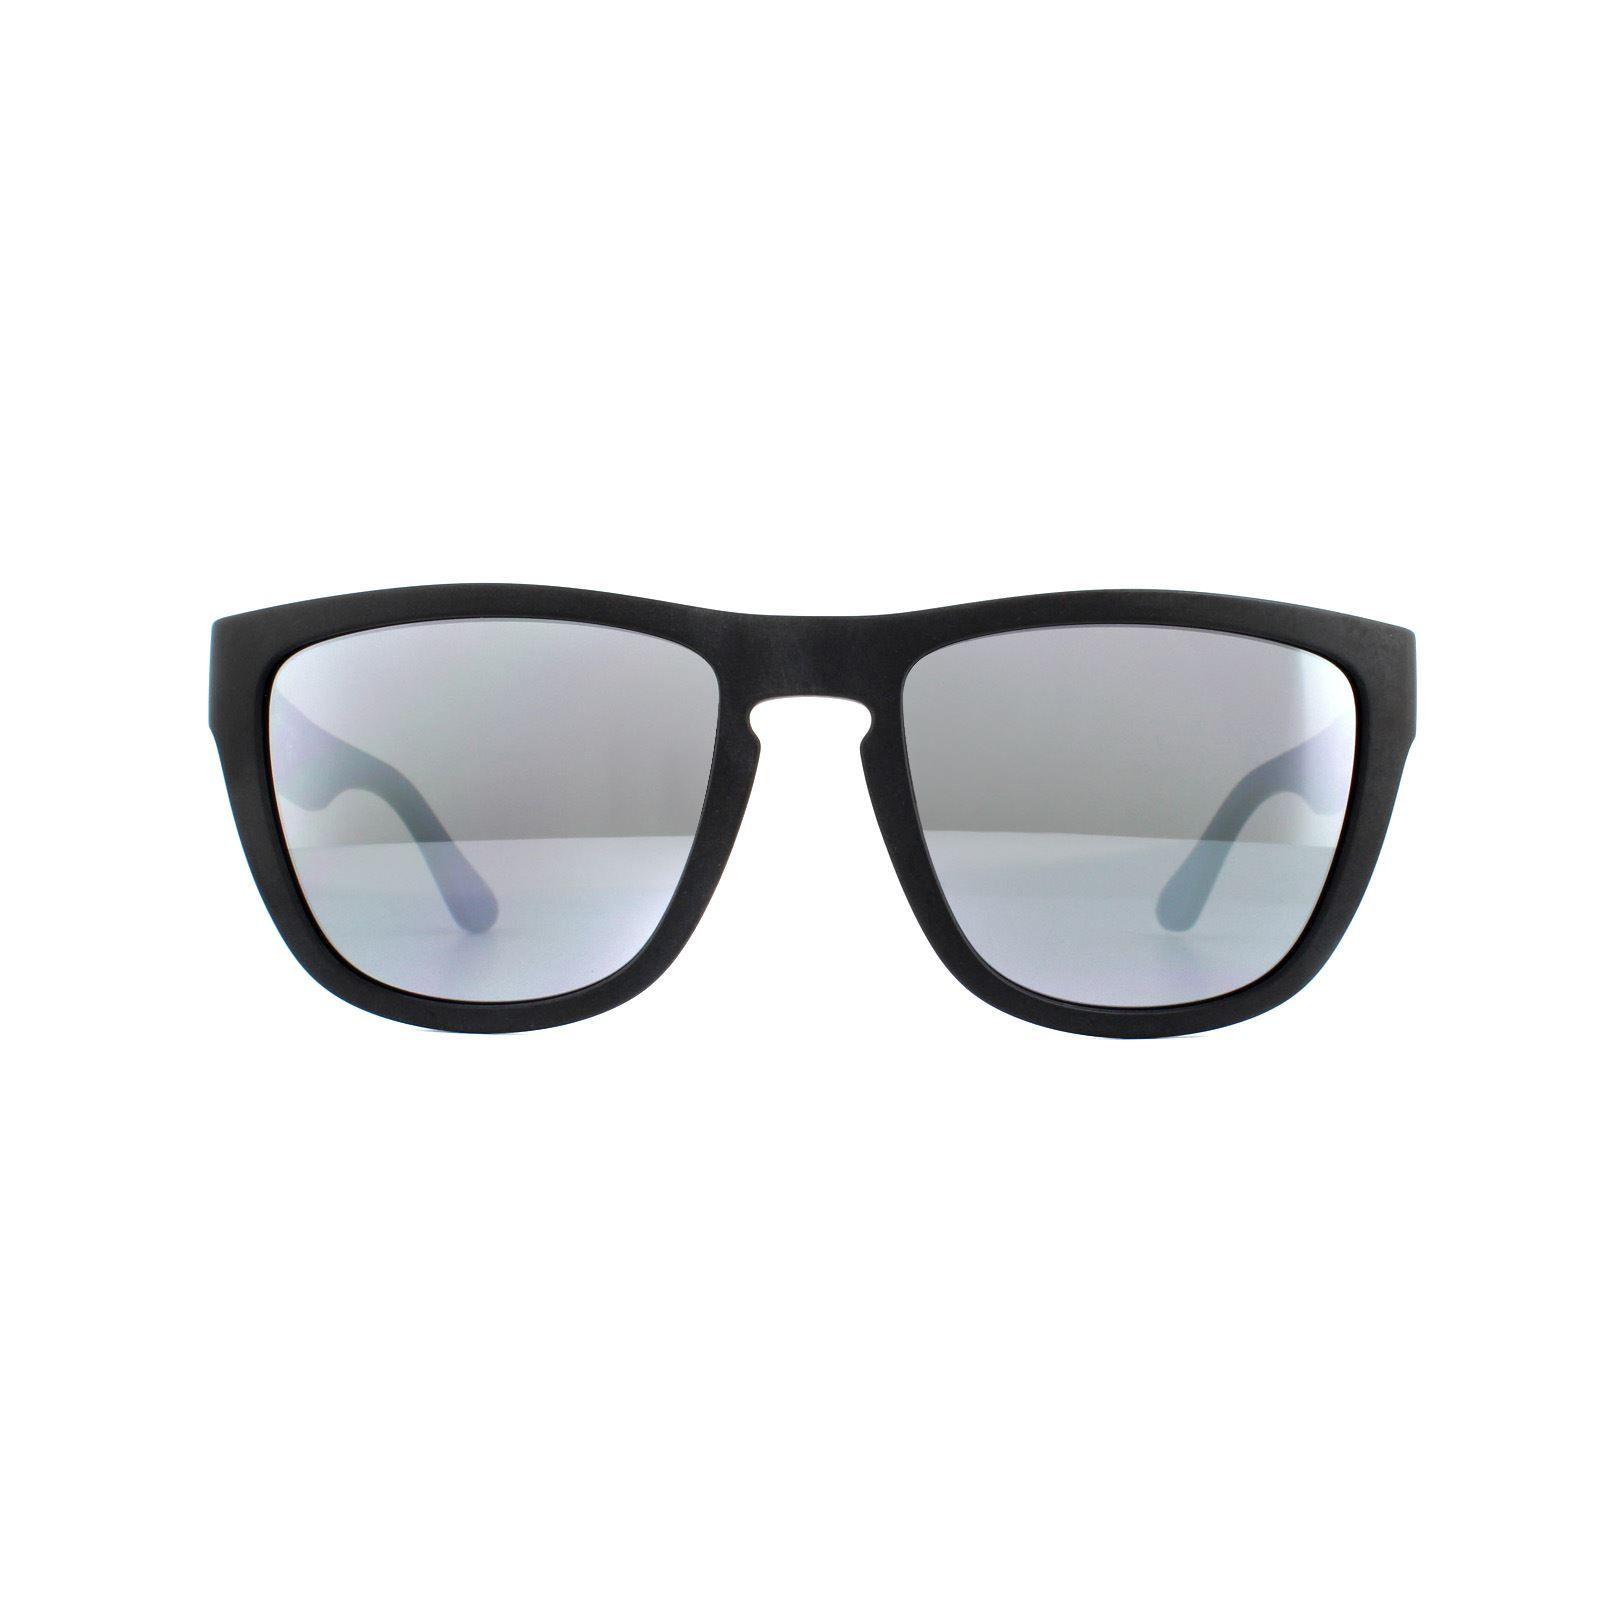 Tommy Hilfiger Sunglasses Th 1557/S 003 T4 Matte Black Black Grey Mirror